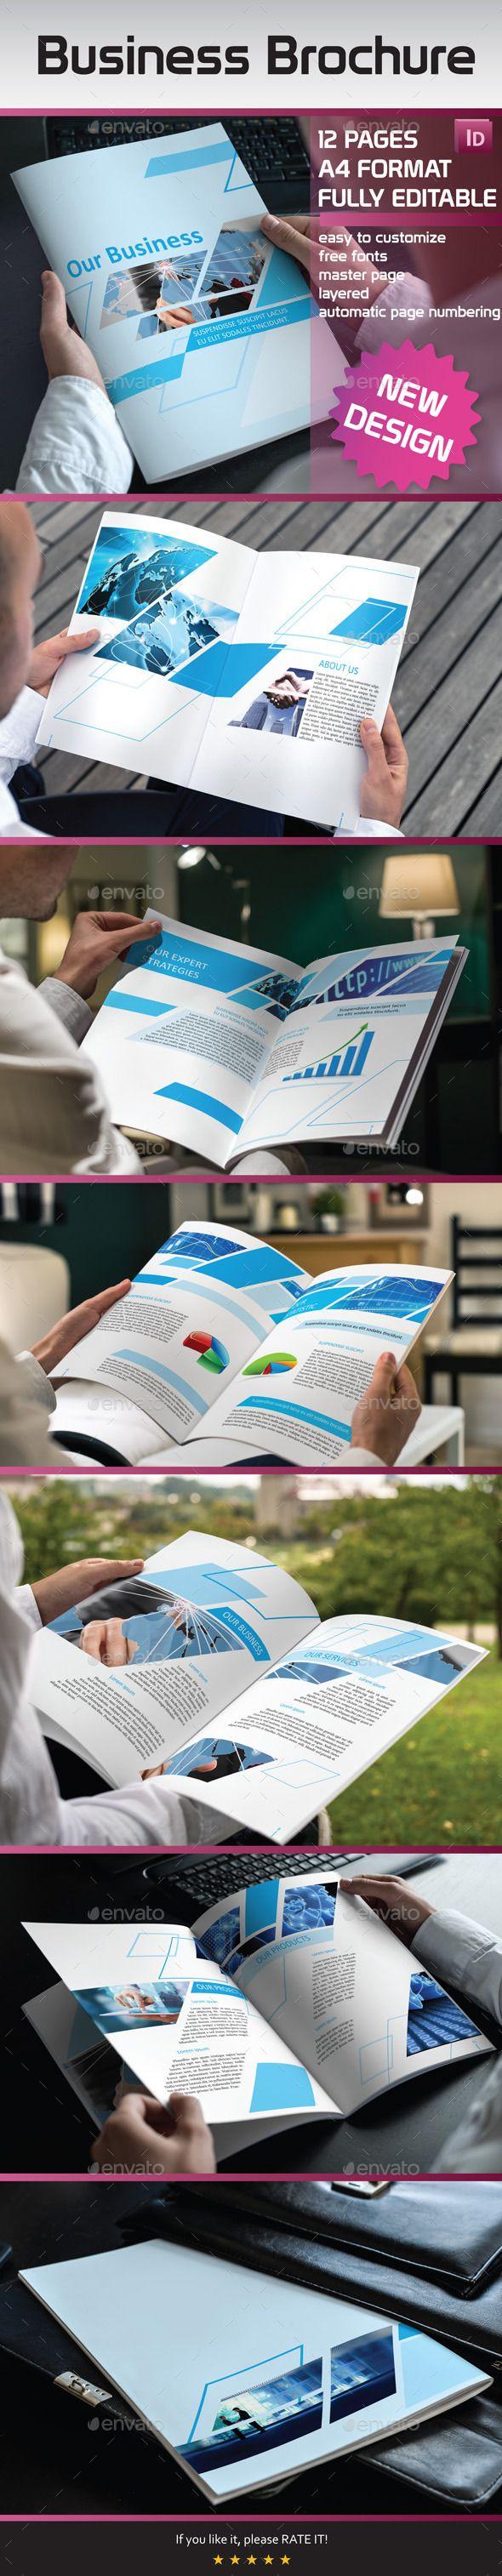 Brochure #Template  - #Brochures #Print #Templates Download here: https://graphicriver.net/item/-brochure-template-/11249254?ref=alena994